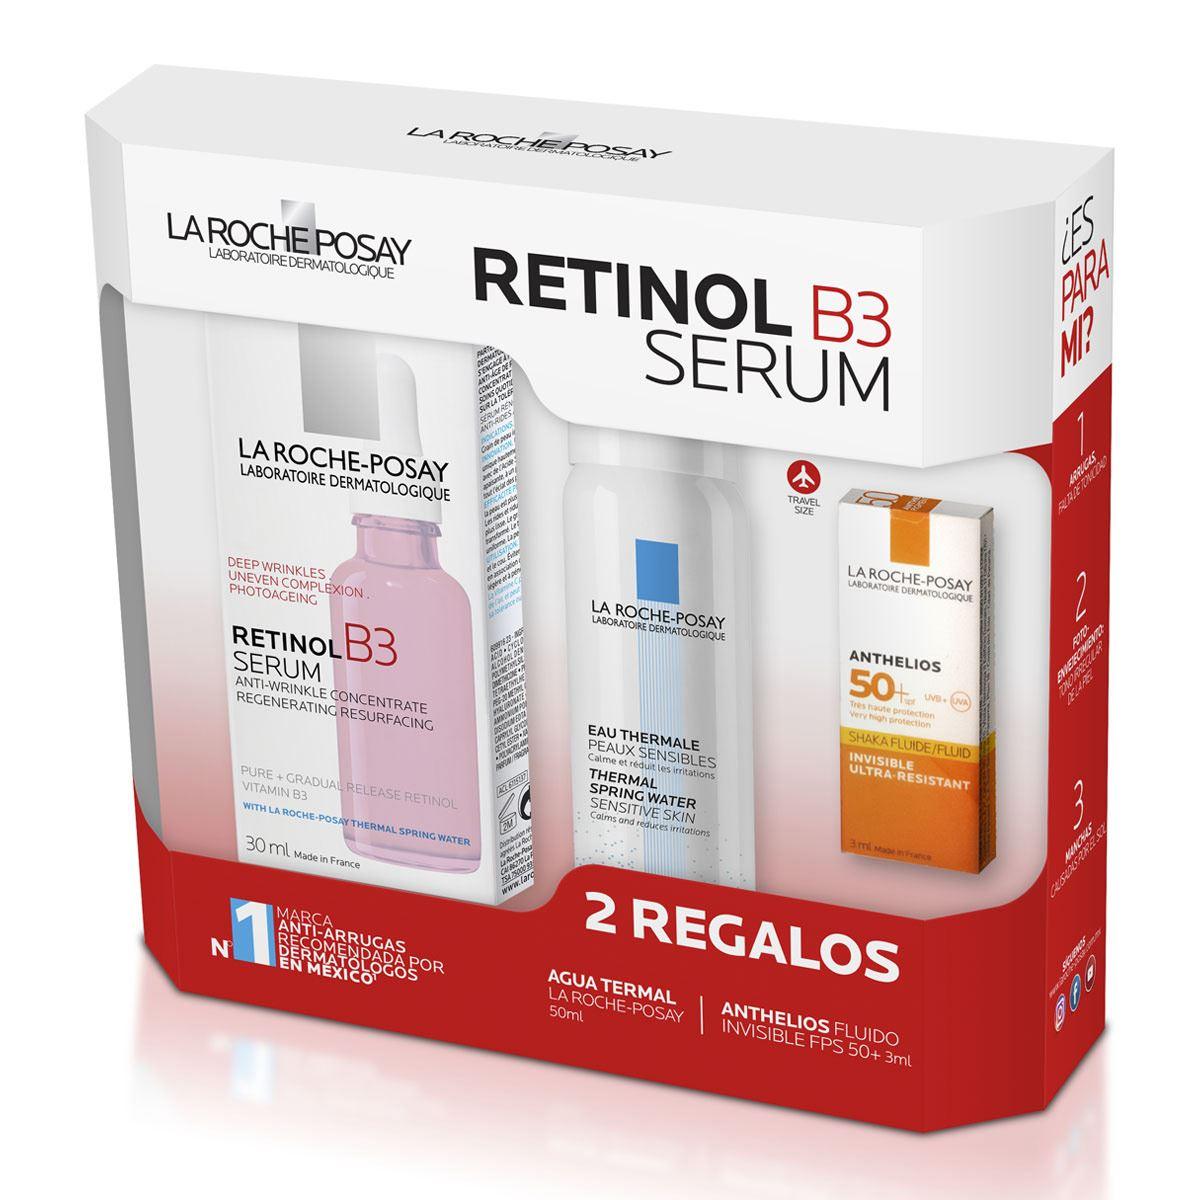 La Roche Posay Pack Retinol B3 Serum 30 ml